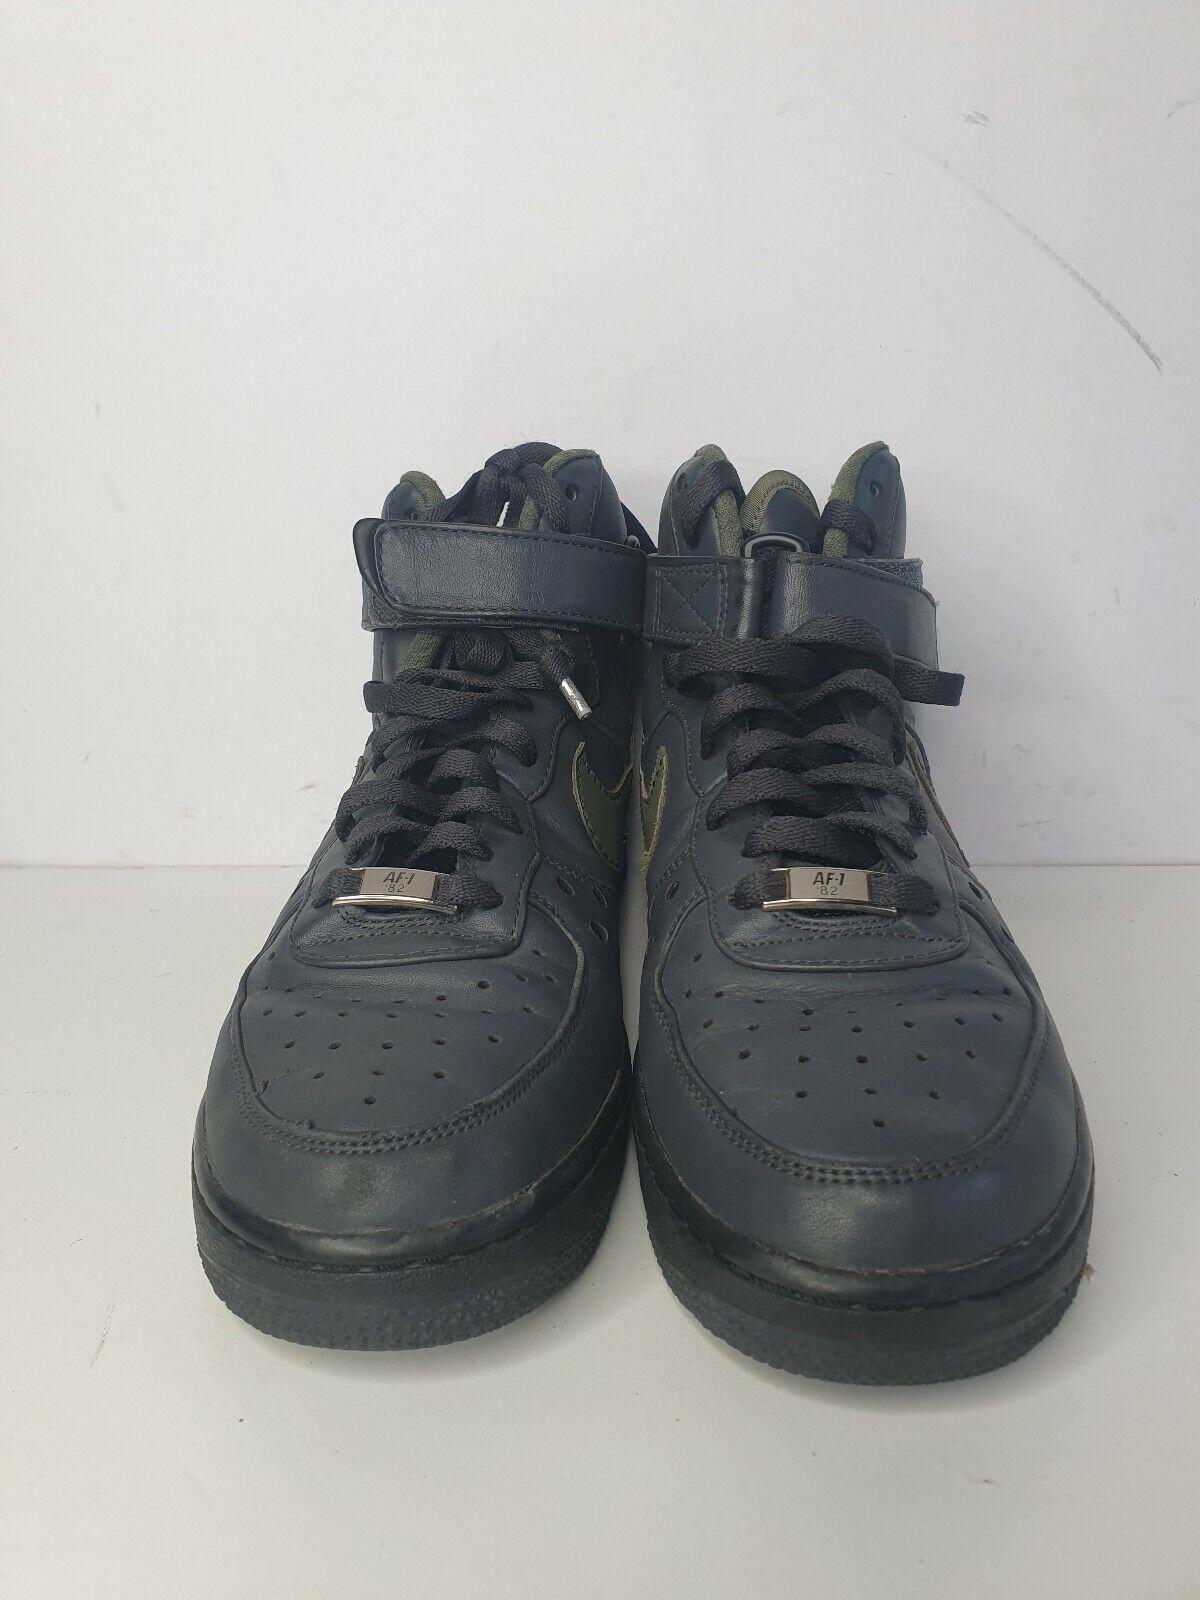 Nike Air Force 1 High Top Charles Barkley Pack 317312-031 grau Größe uk6 eu40(17